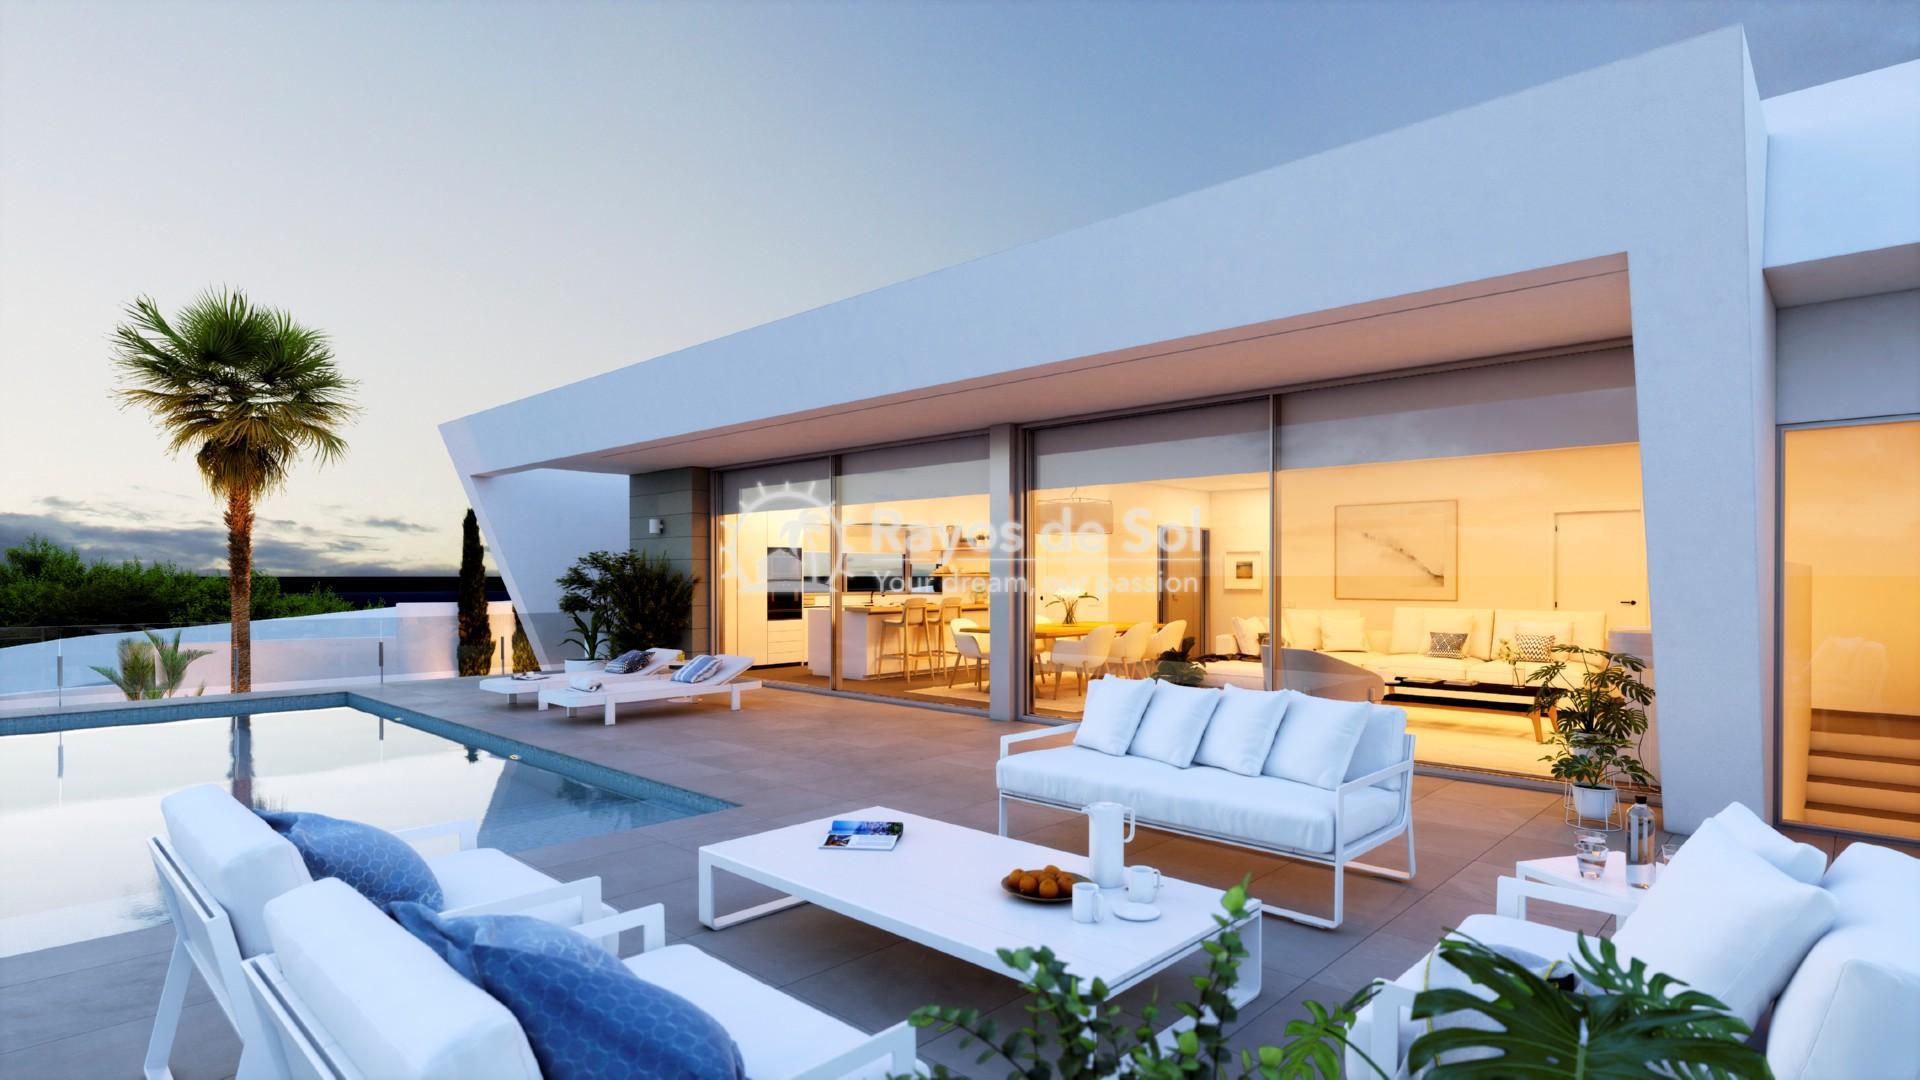 Villa with stunning views in Cumbre del Sol, Benitachell, Costa Blanca (BEVALIDIT) - 2